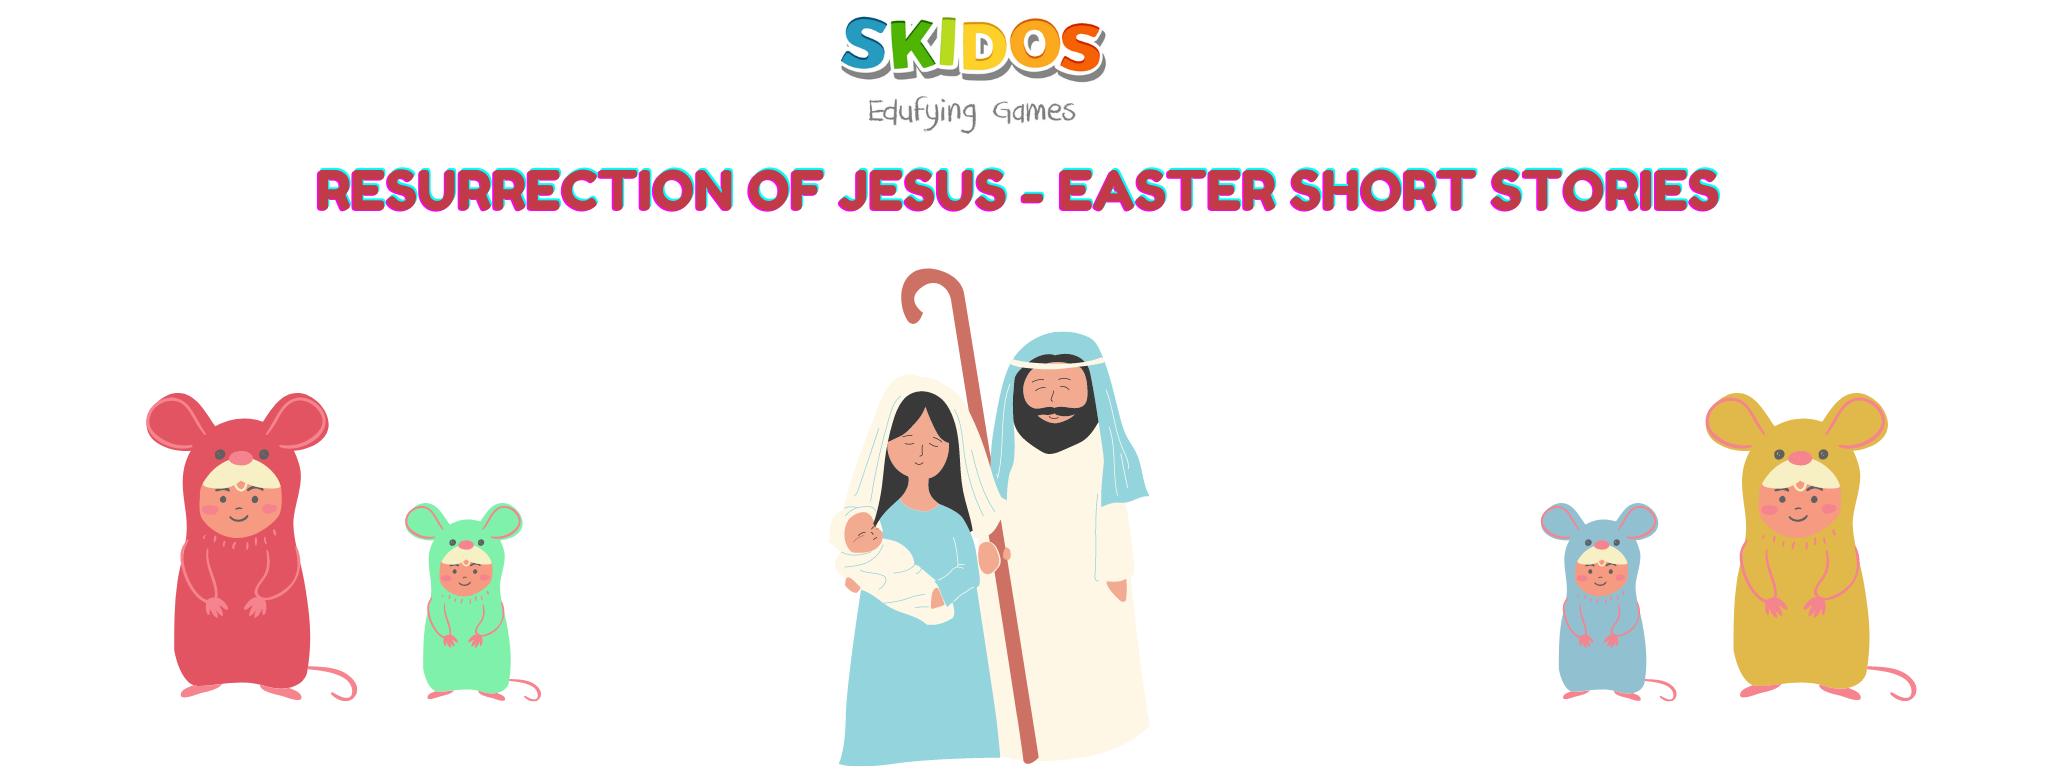 Easter short stories for kids Resurrection of Jesus